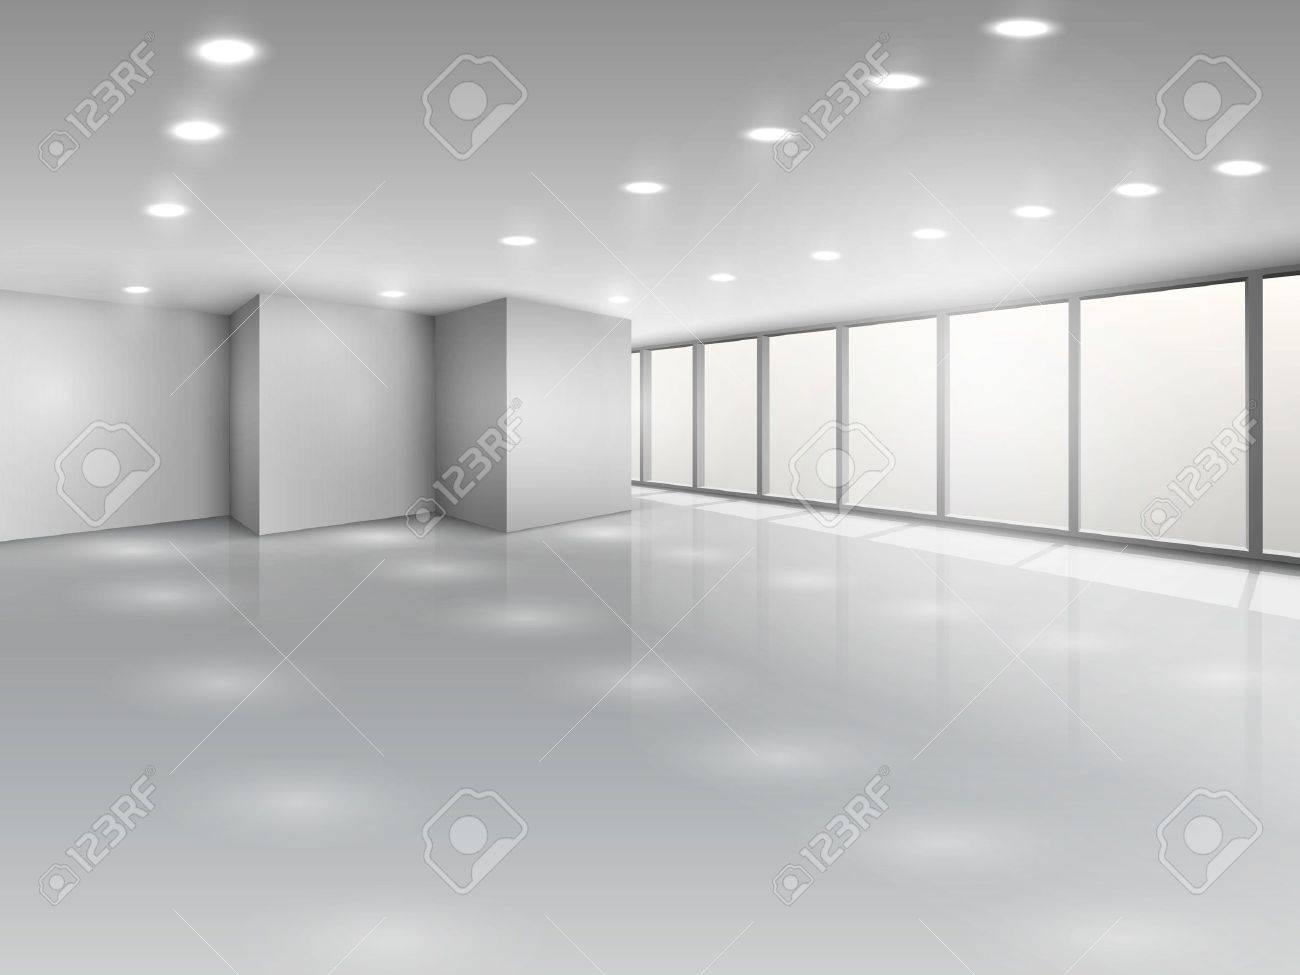 Interior office windows - Light Conference Room Or Office Open Space Interior With Windows Vector Illustration Stock Vector 24757724